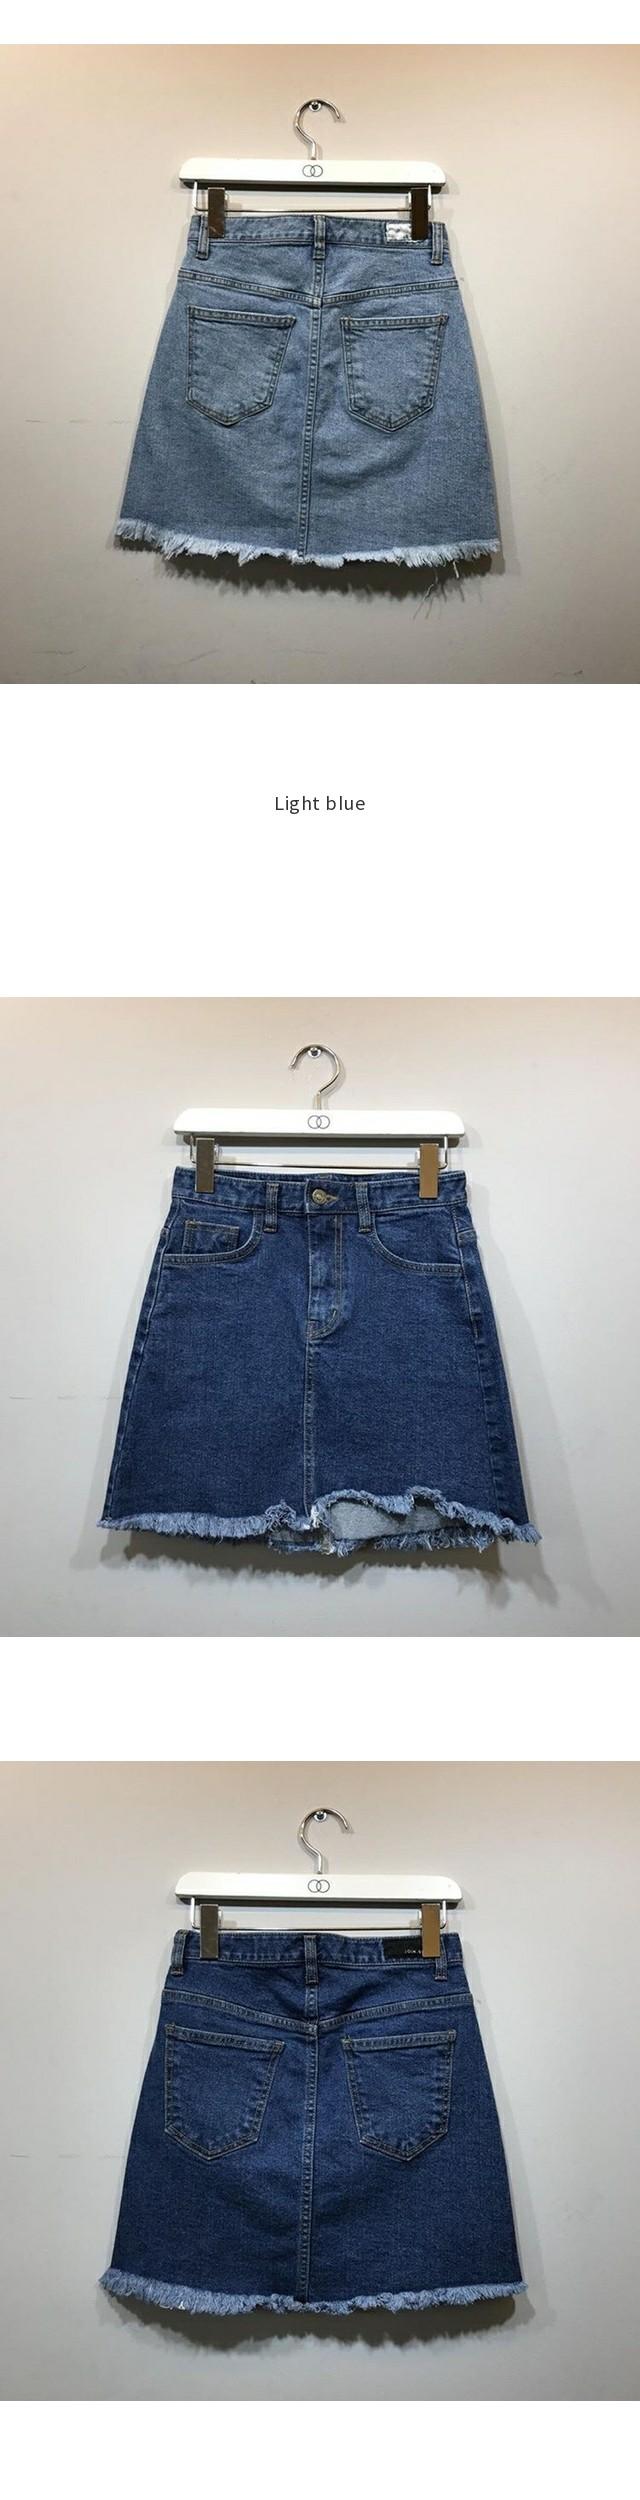 Age denim skirt